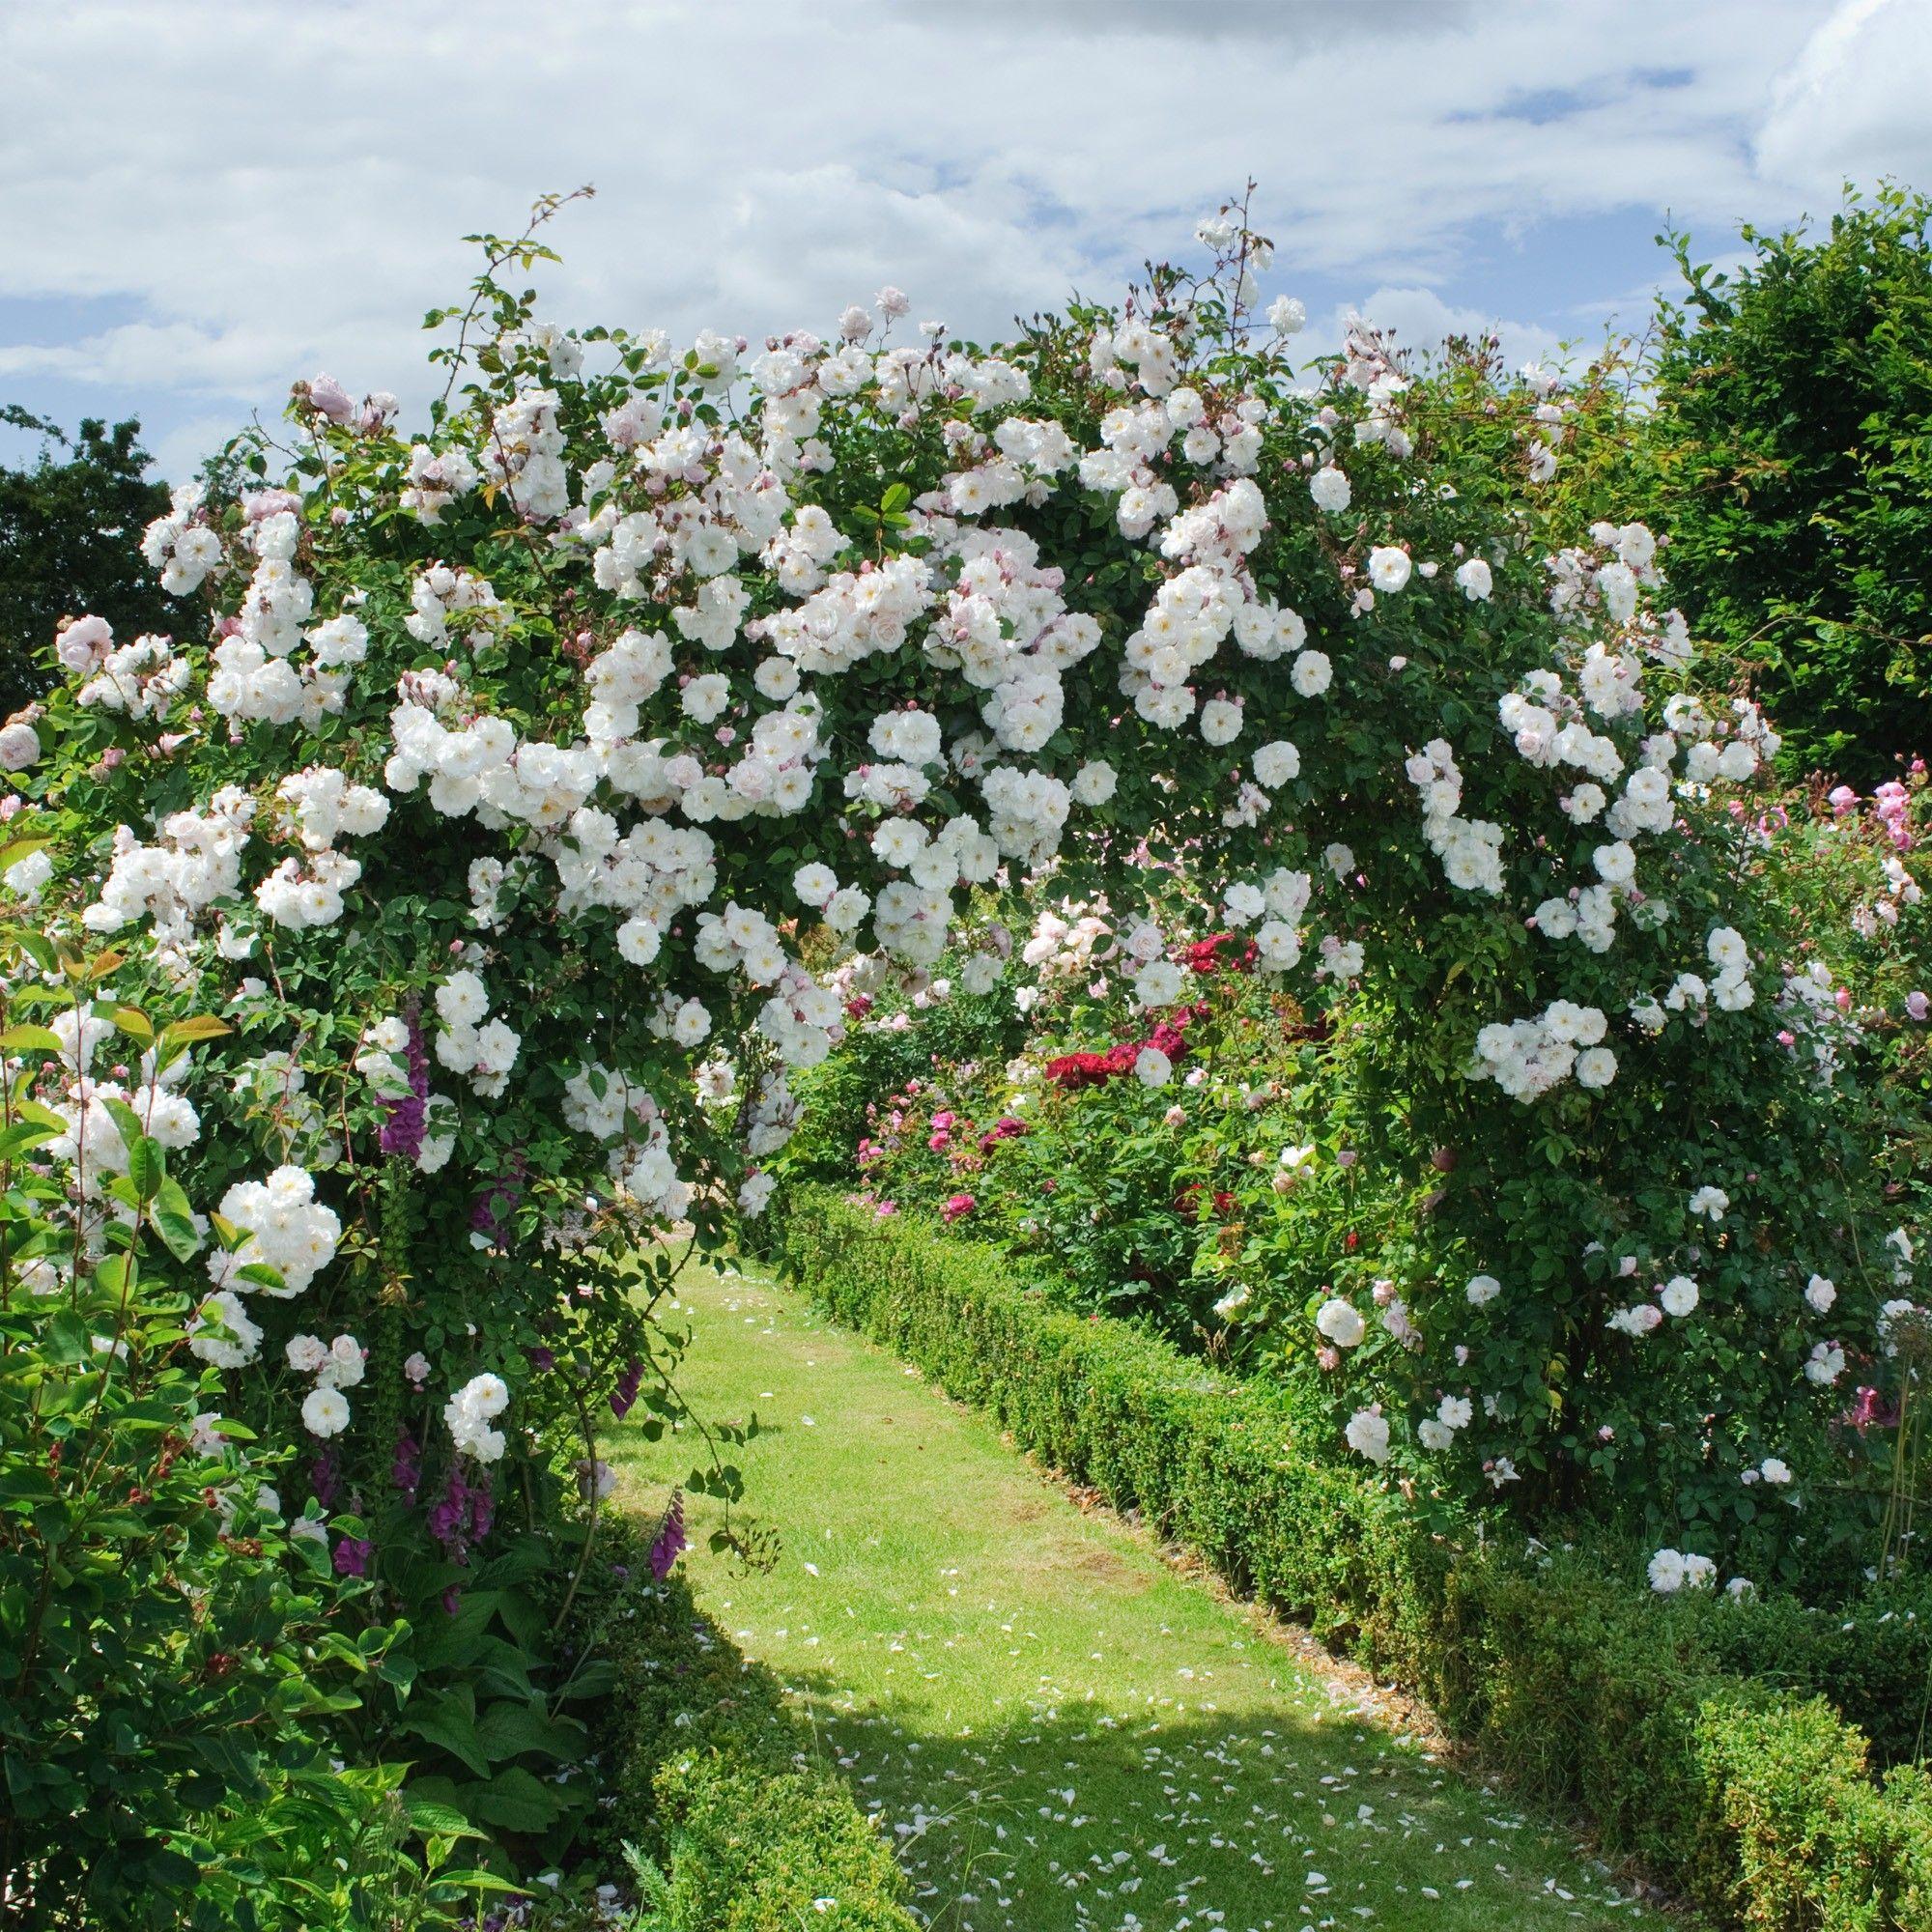 Adélaïde d'Orléans Splendid roses David austin roses